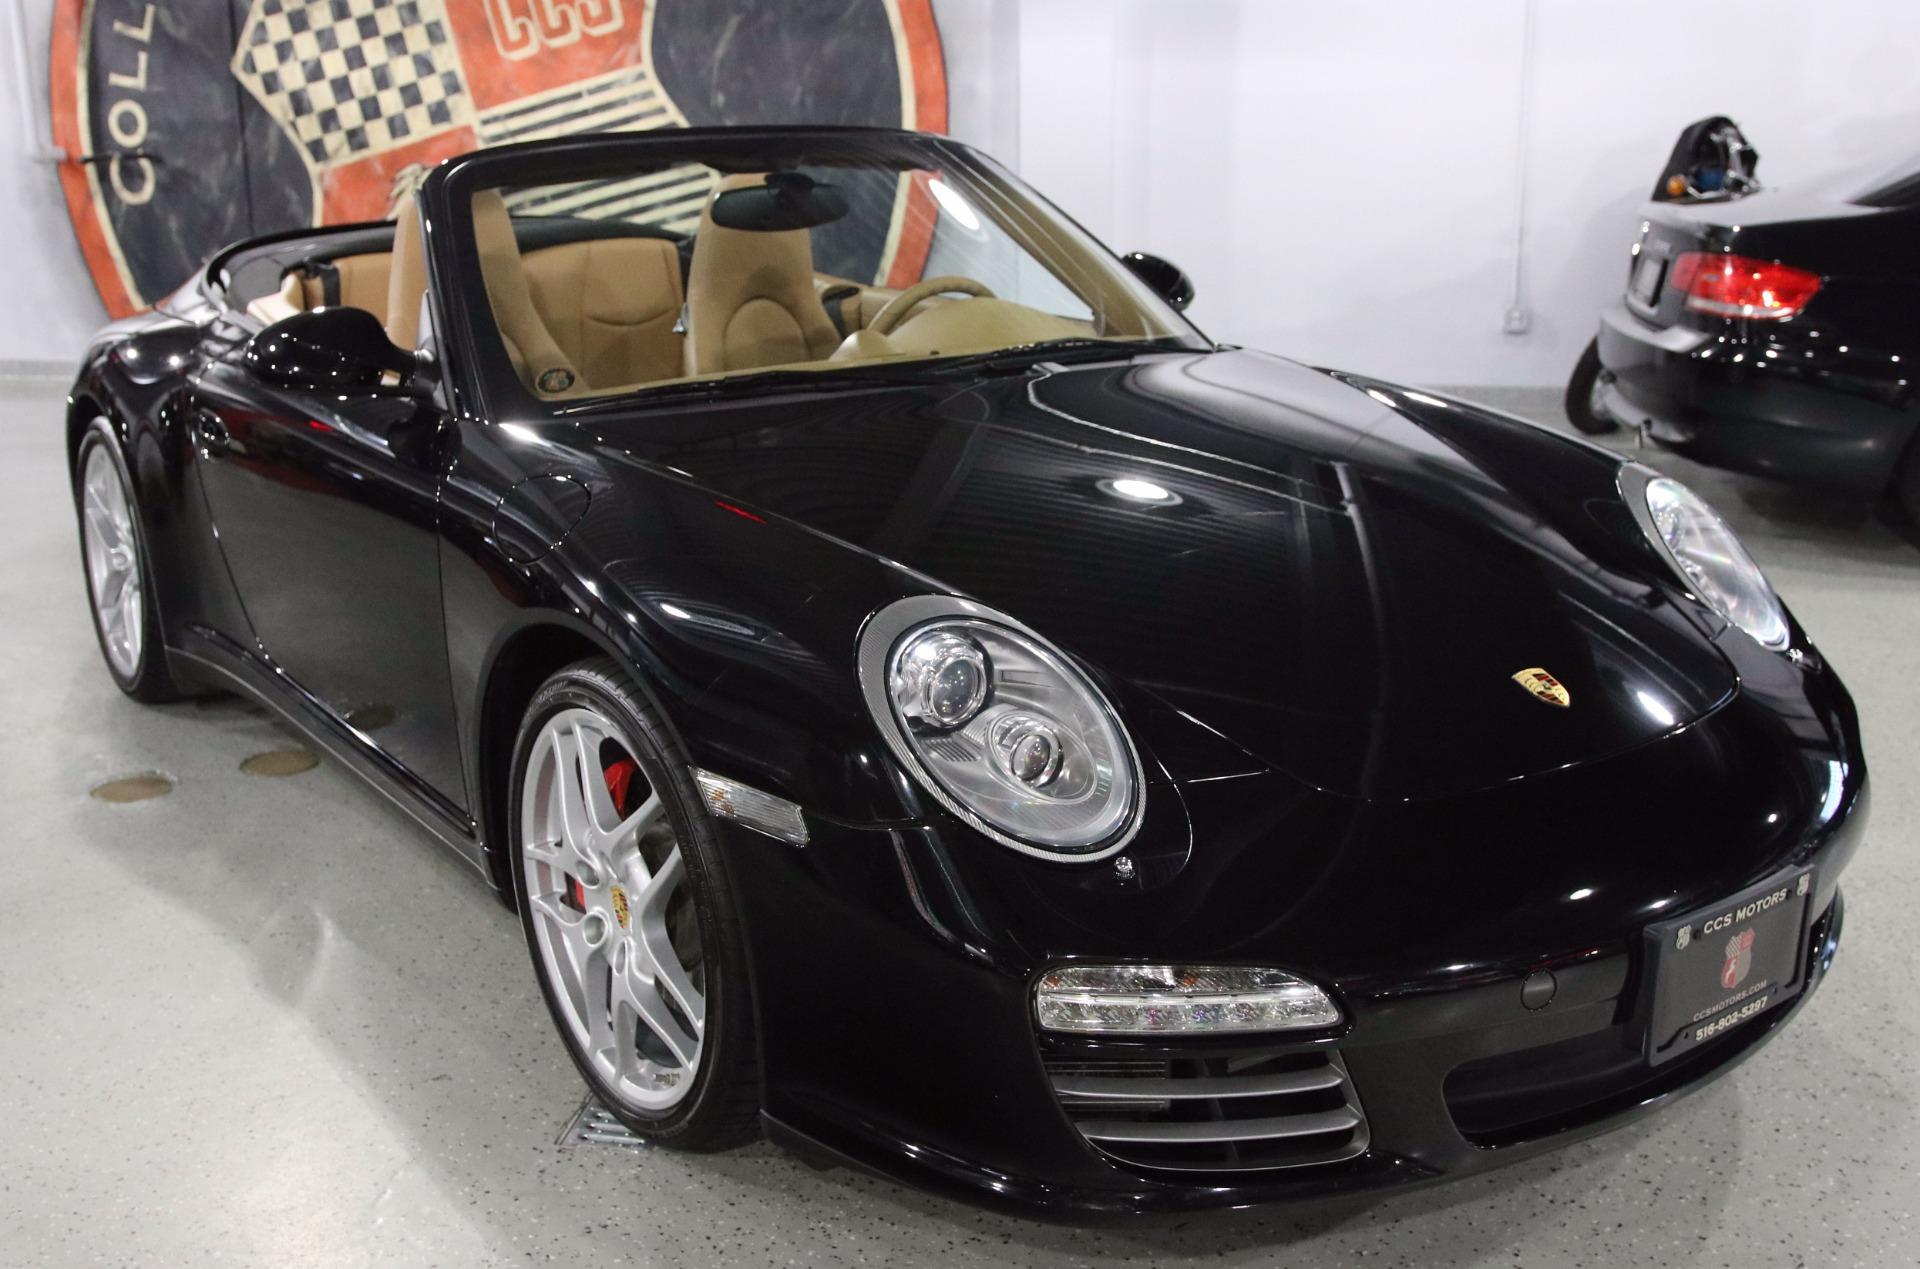 2009 porsche 911 carrera 4s cabriolet stock 1223 for sale near oyster bay ny ny porsche dealer. Black Bedroom Furniture Sets. Home Design Ideas